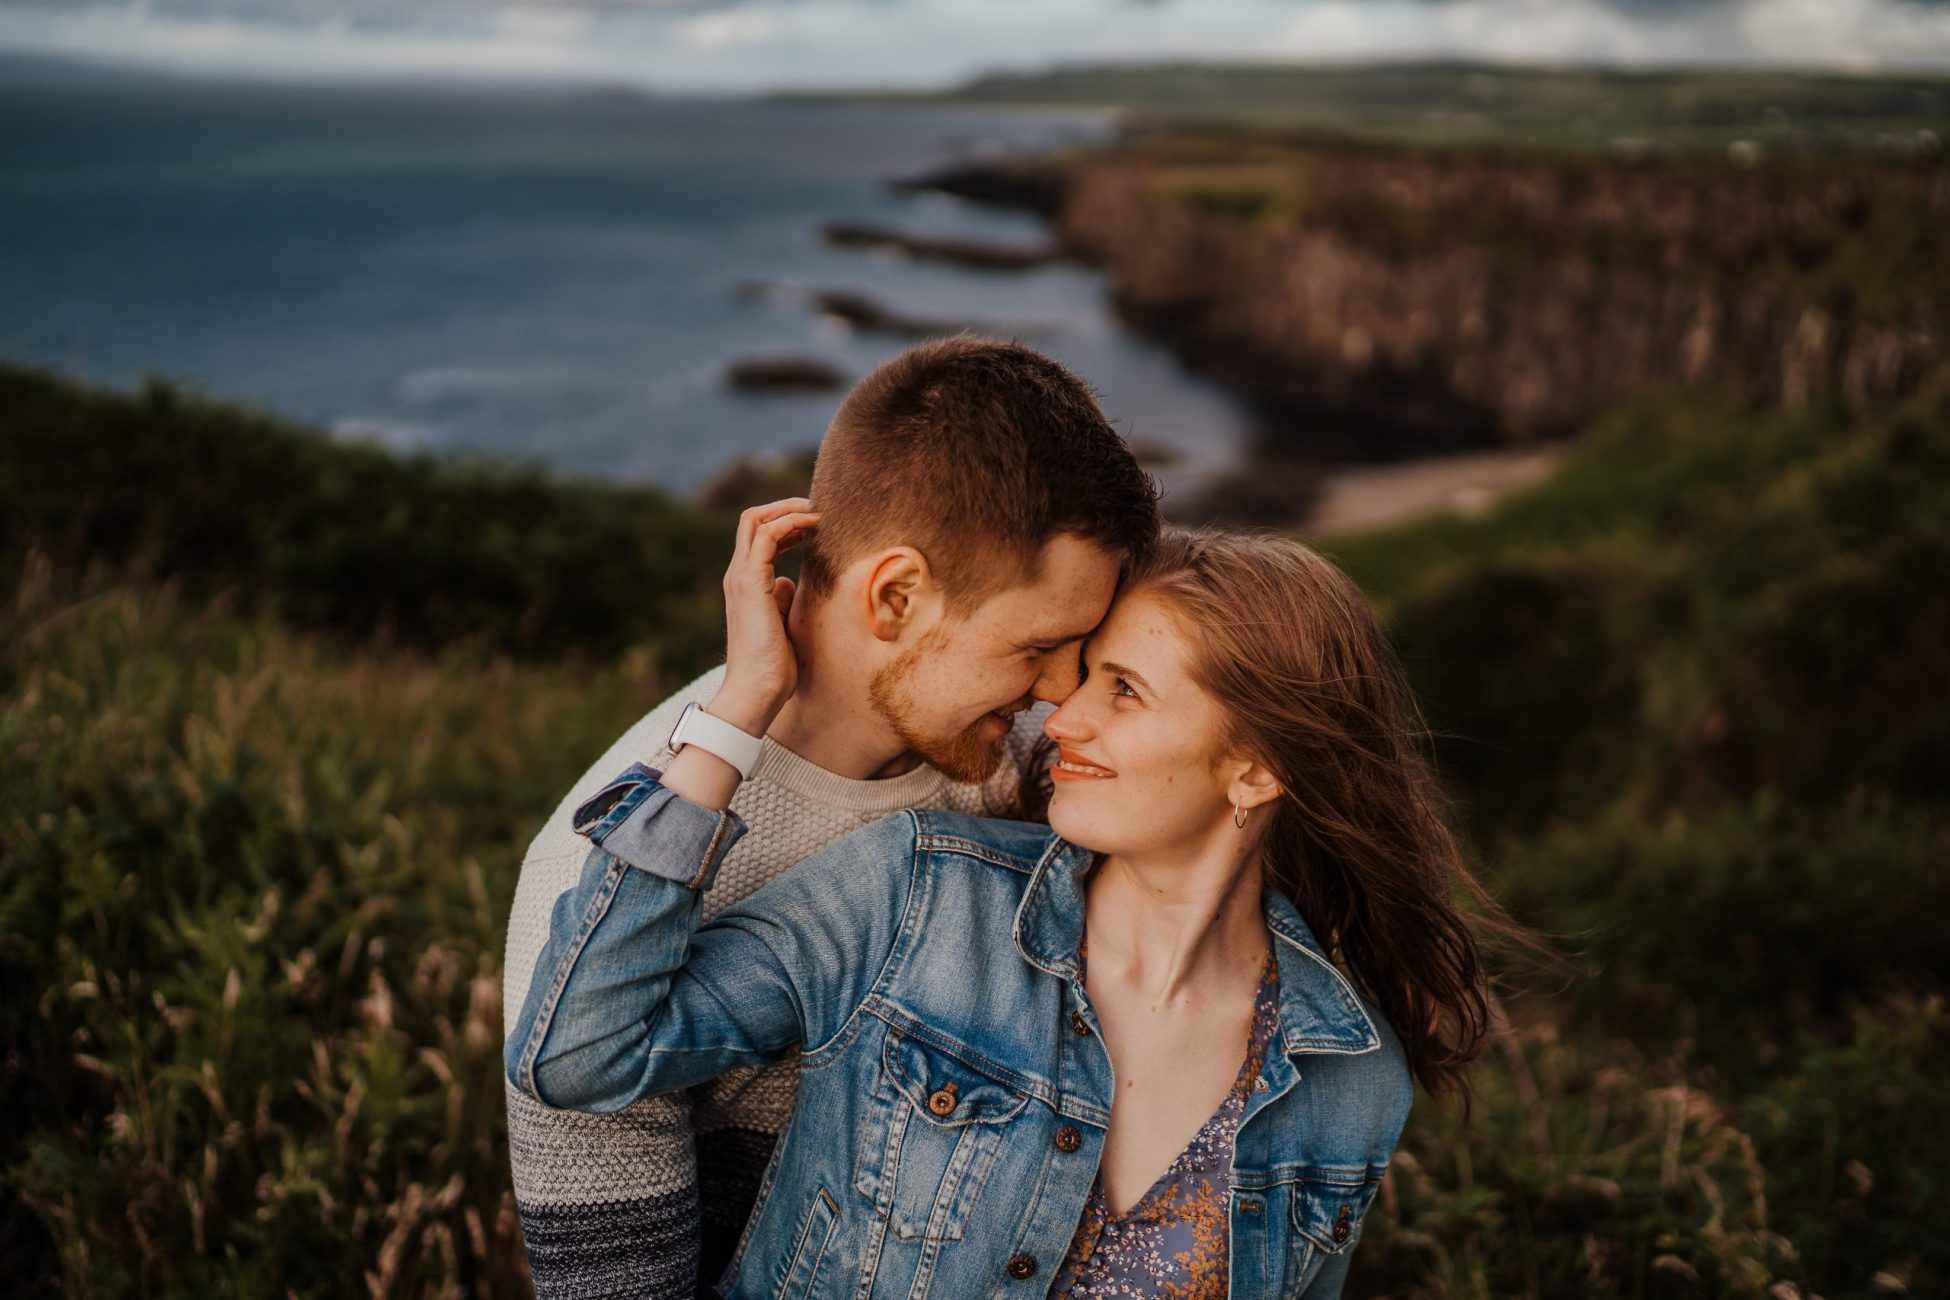 Tiffany Gage is a Wedding photographer in Northern Ireland